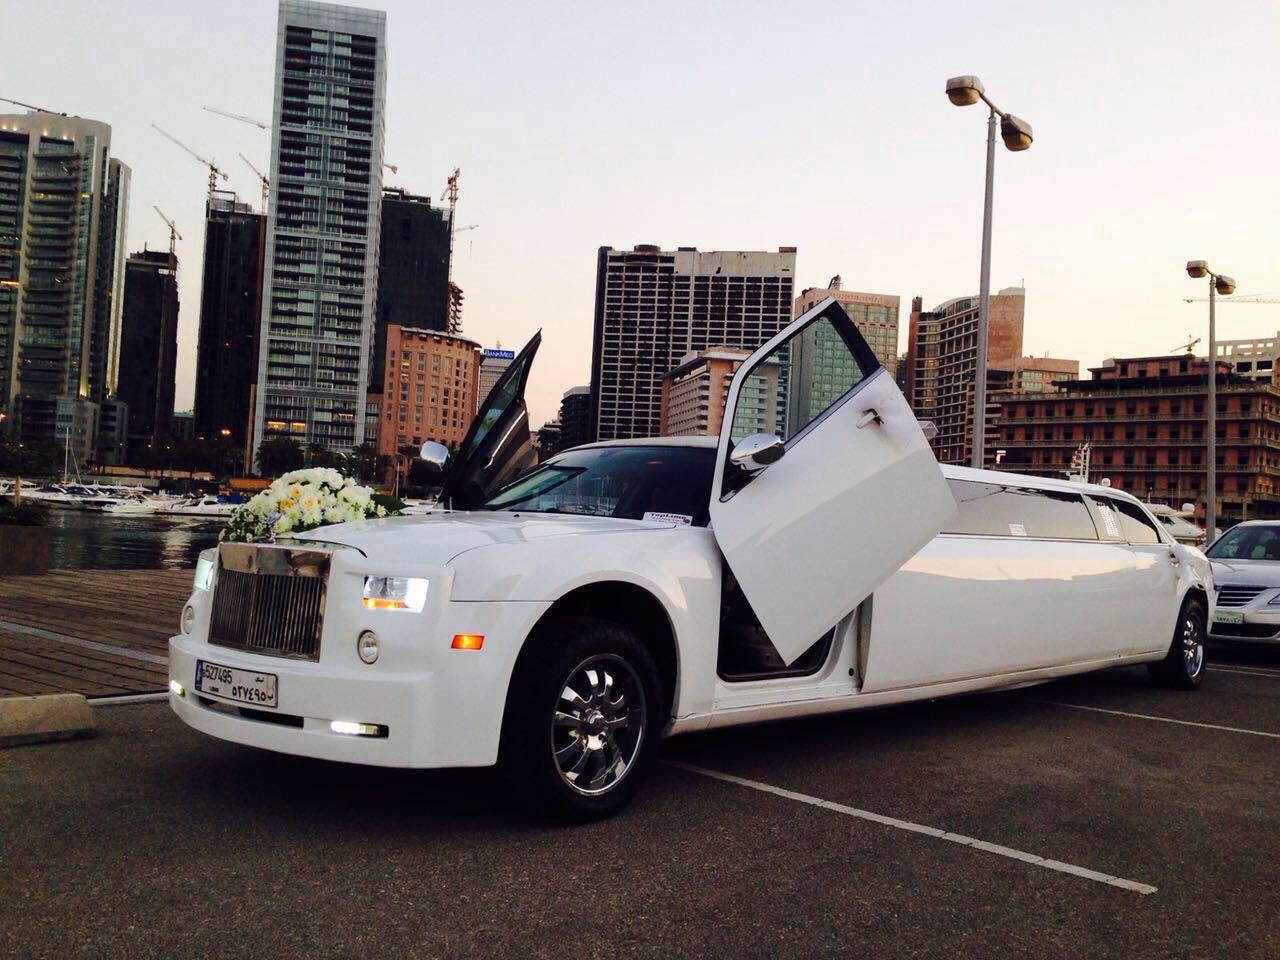 White wedding limousine phantom car with bridal flowers decoration